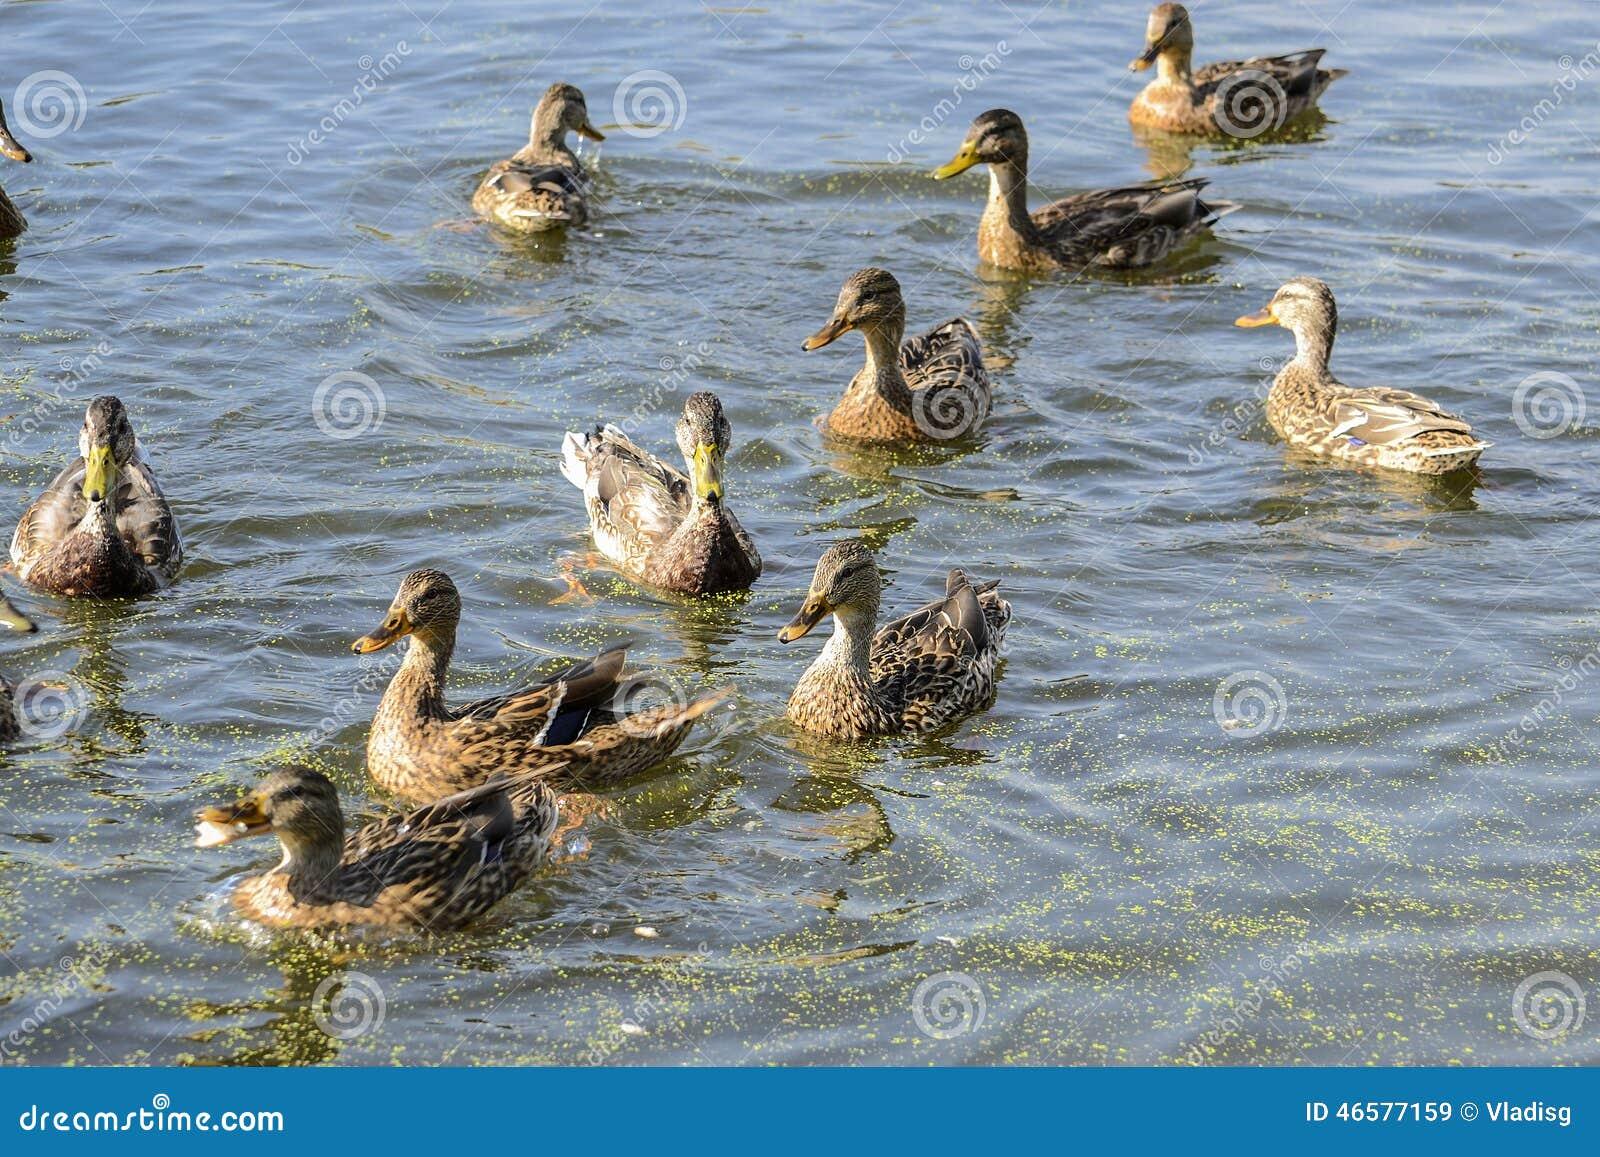 ducks swimming on the - photo #41